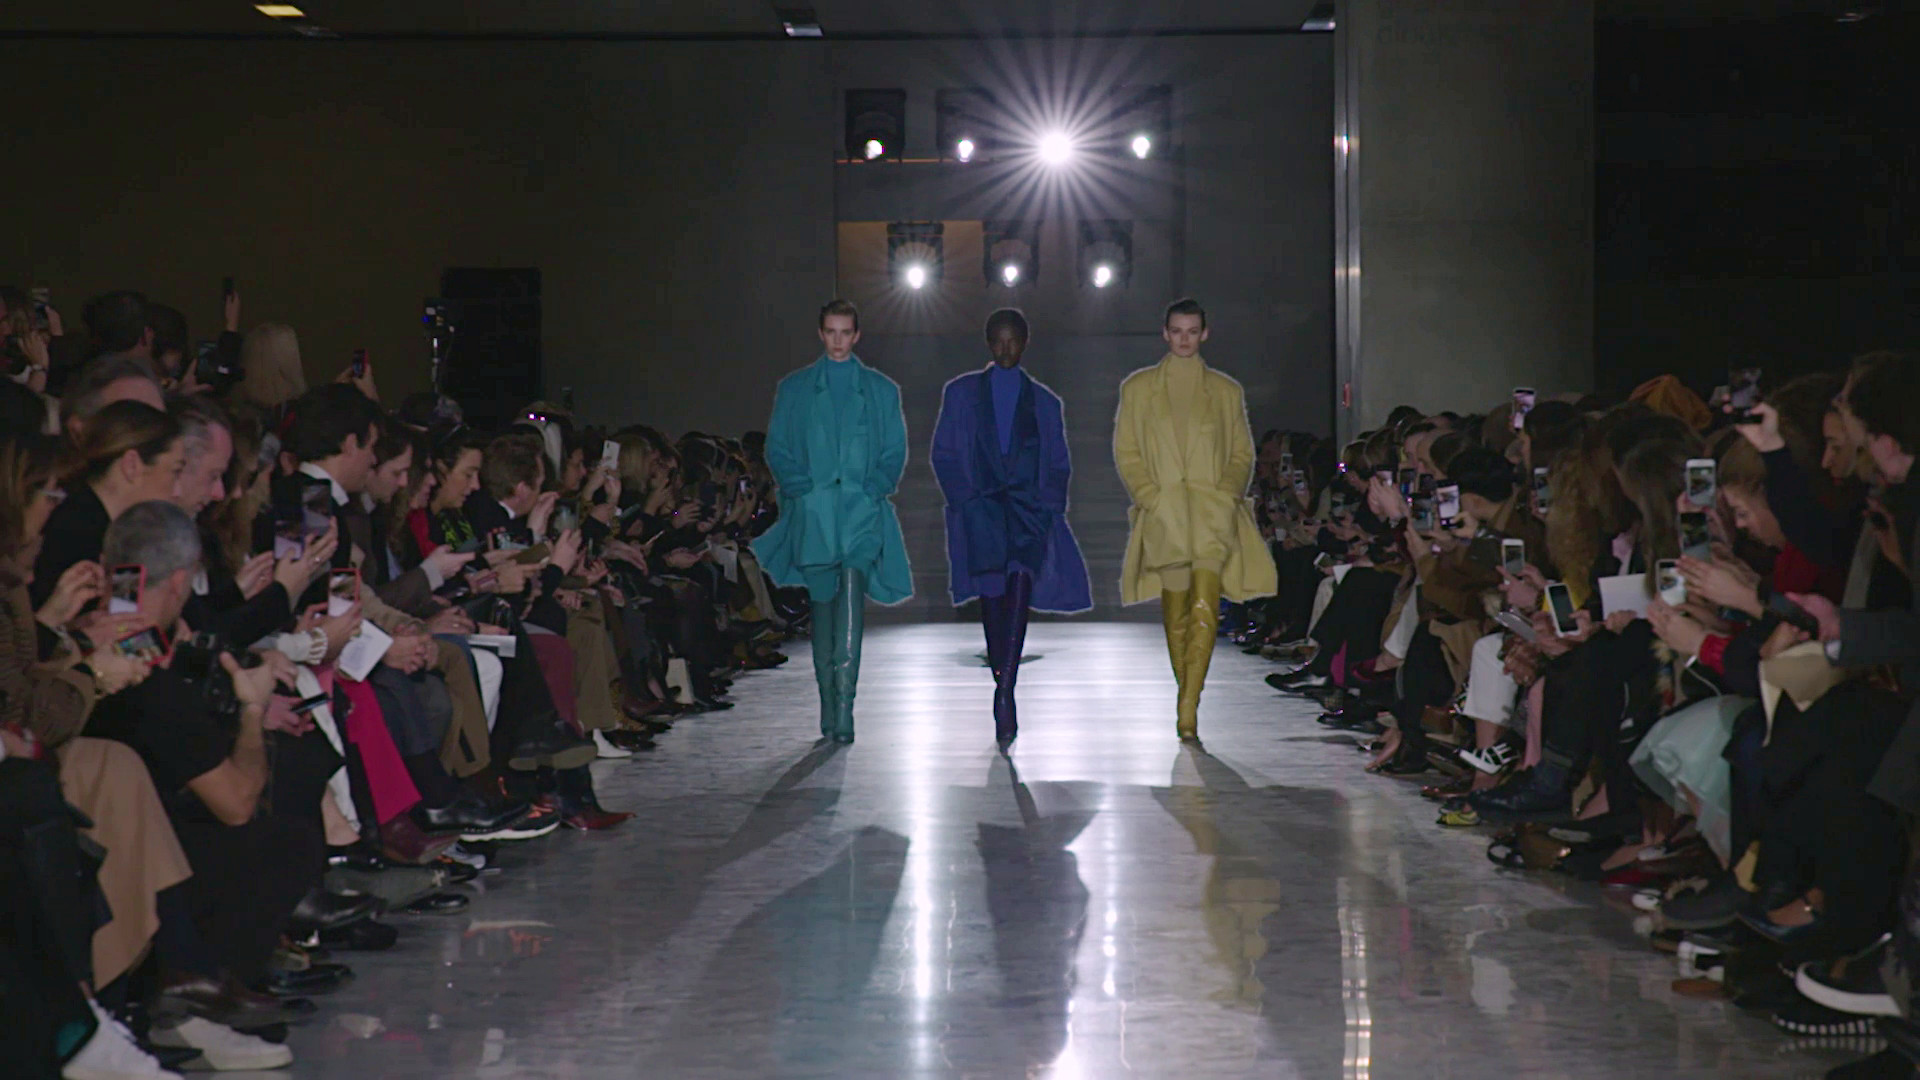 Max Mara Fall Winter Collection 2019 - Milan Fashion Show